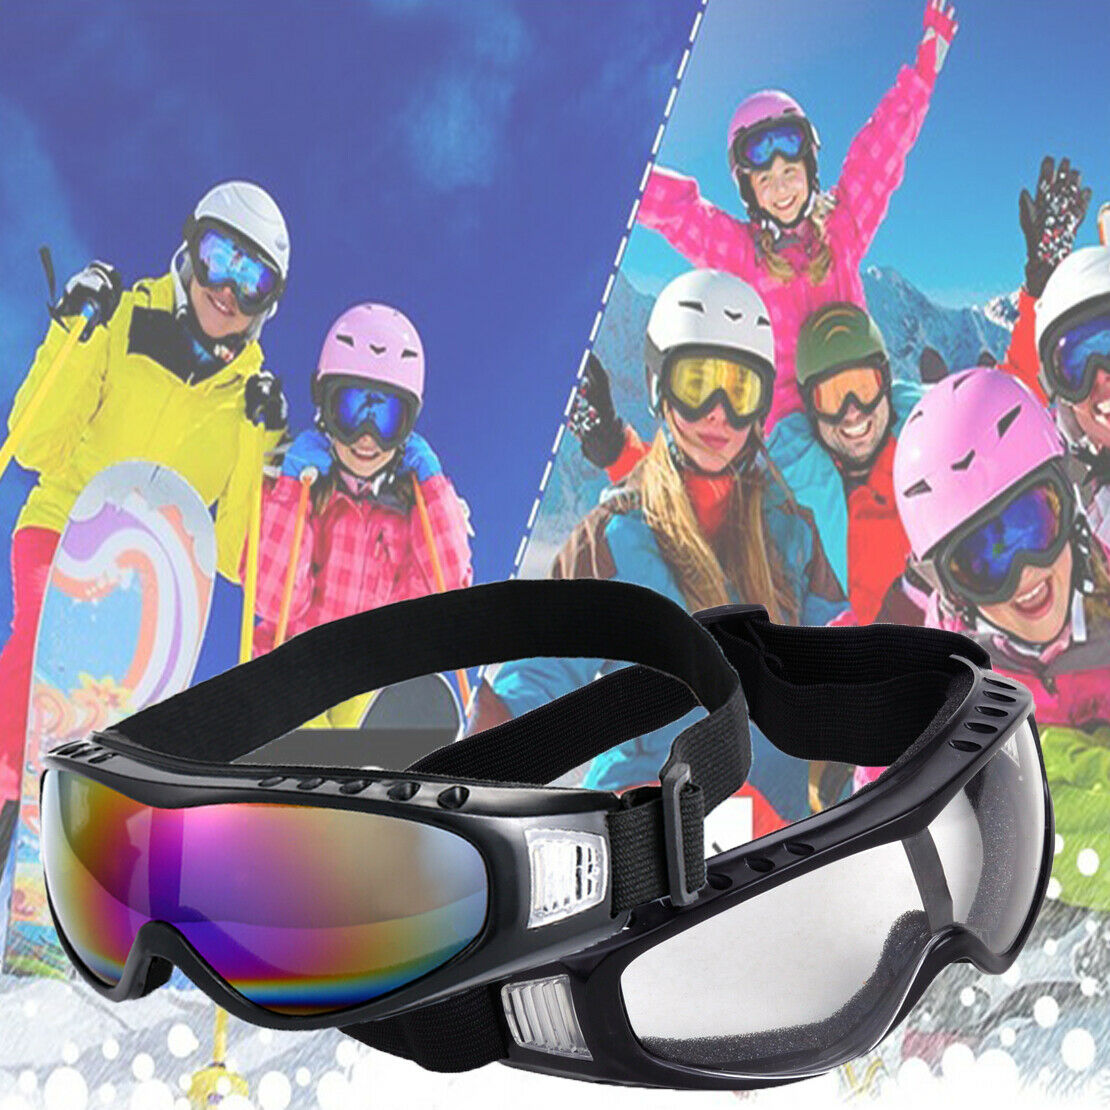 2X Ski Snowmobile Sun Glasses Eyewear Chromatic//Silver Winter Snow Sport Goggles